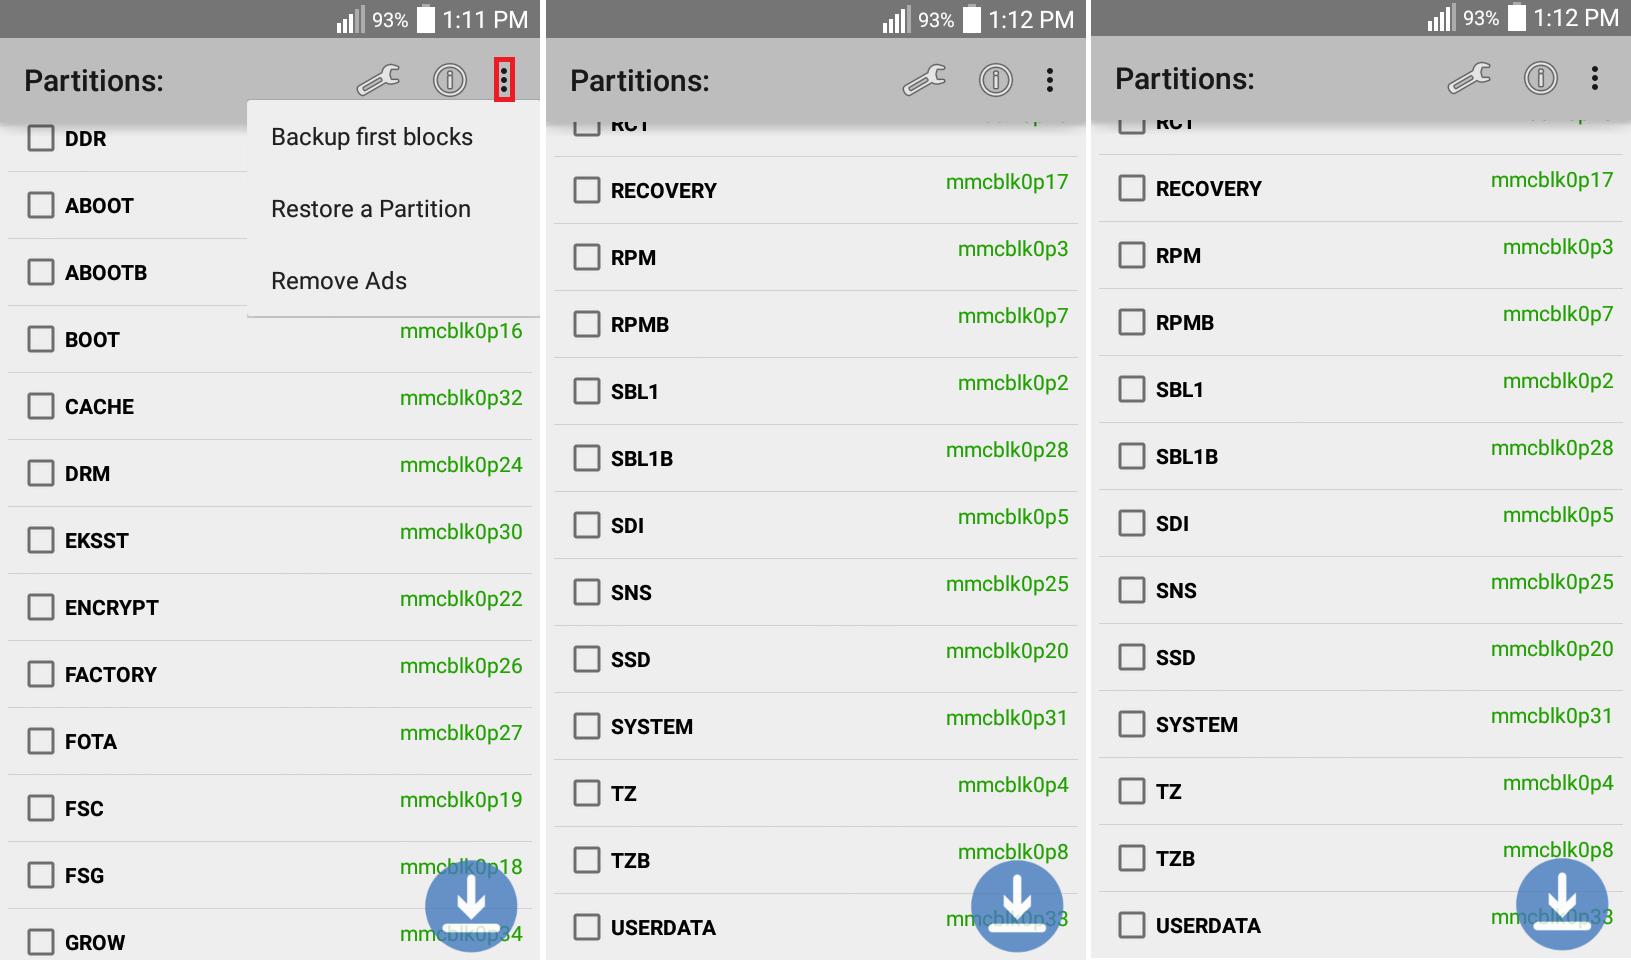 Listado de particiones del sistema Android (LG D415).